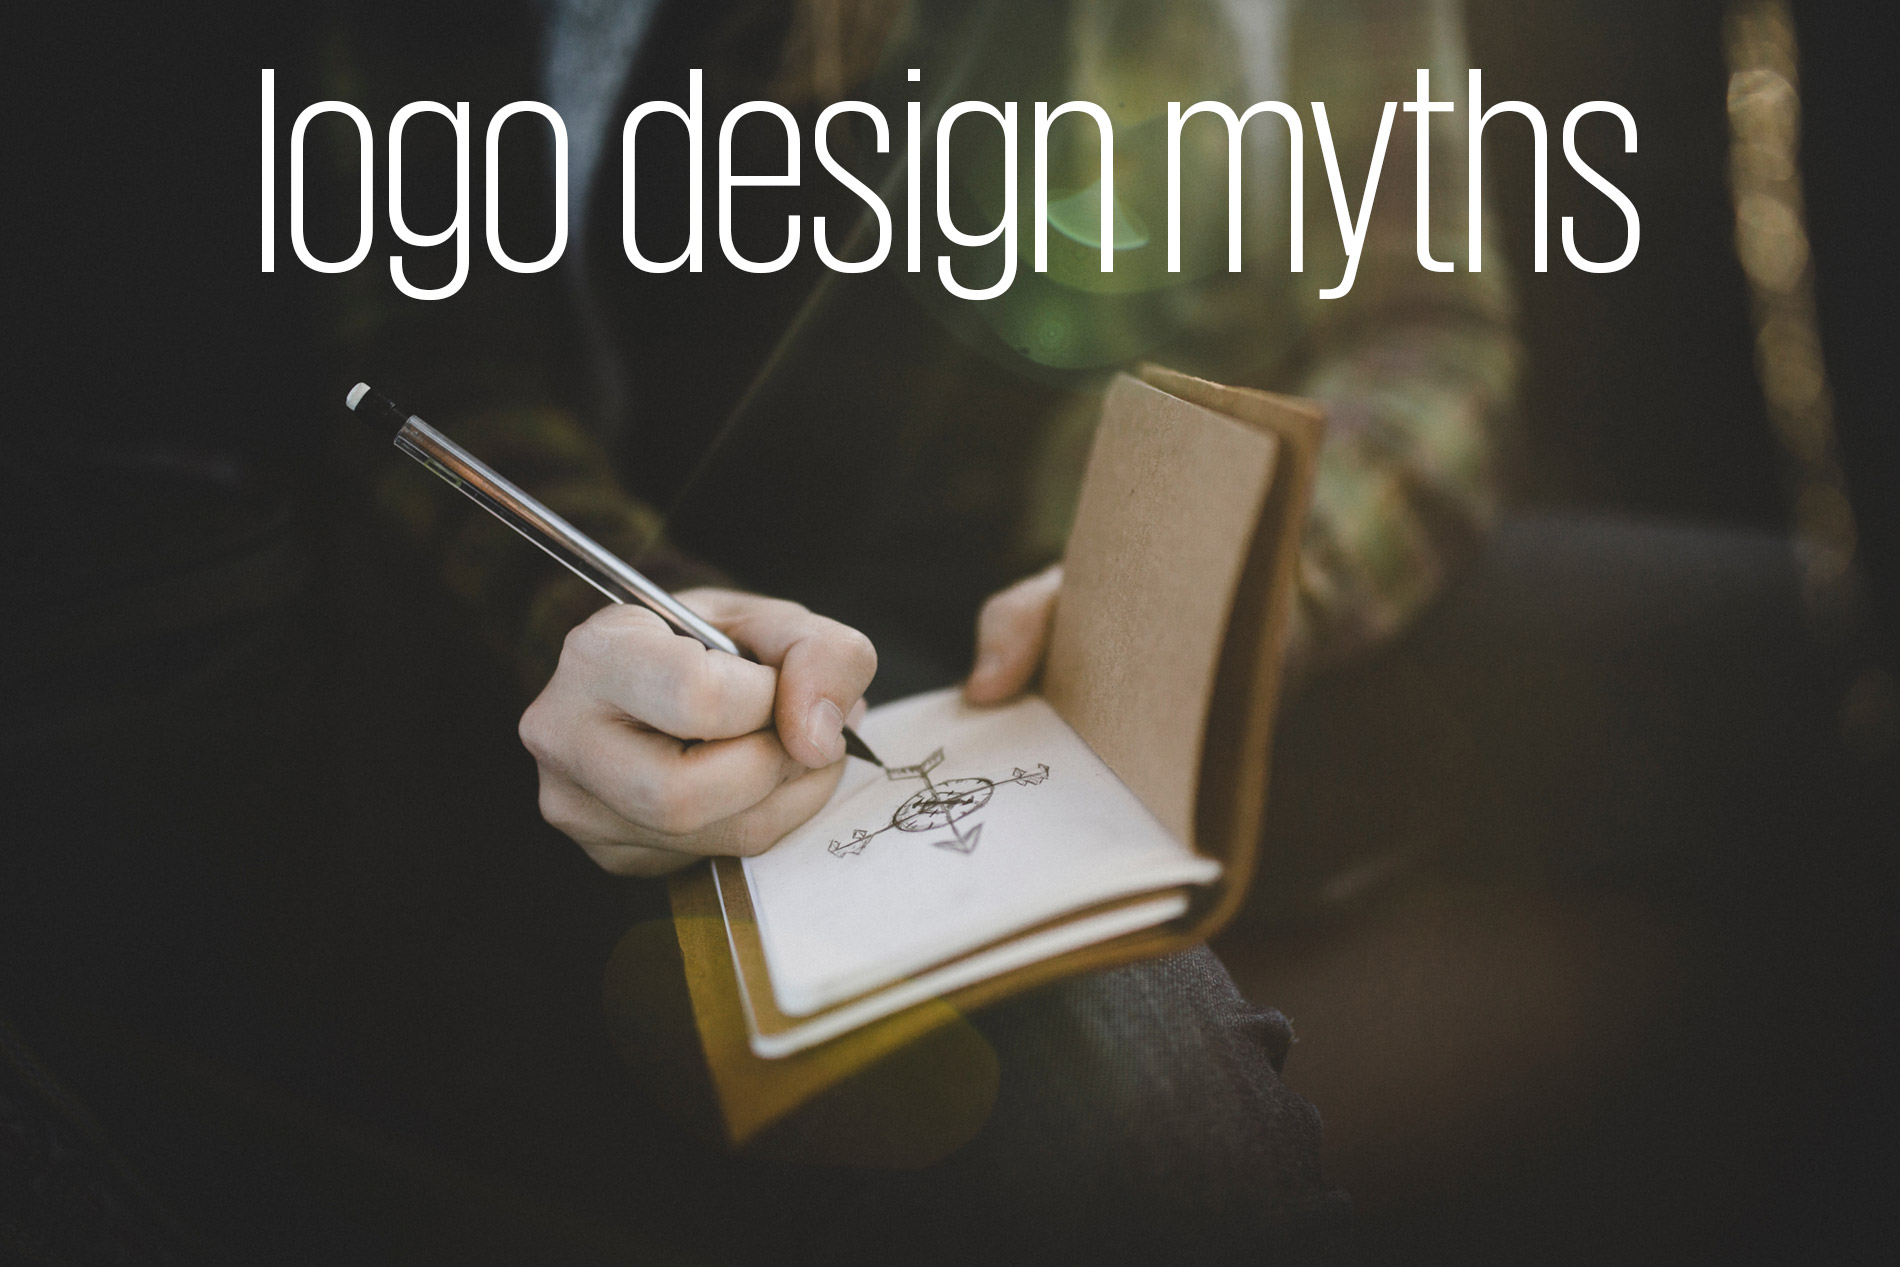 Logo design myths